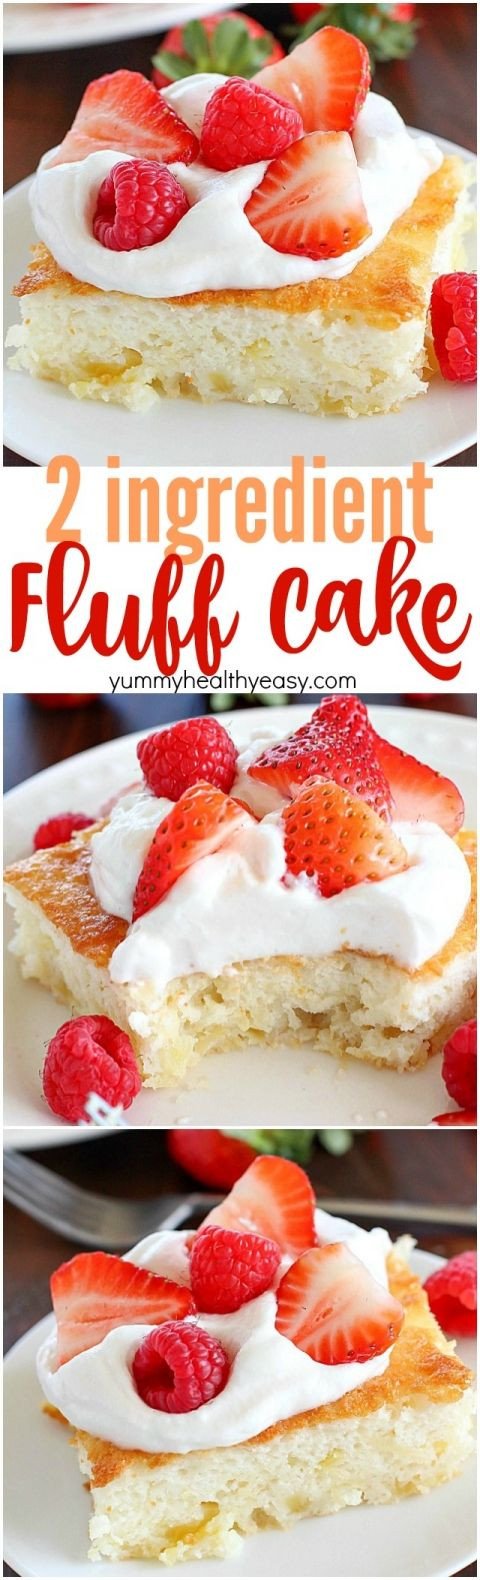 Low Calories Desserts  Best 25 Low calorie cheesecake ideas on Pinterest